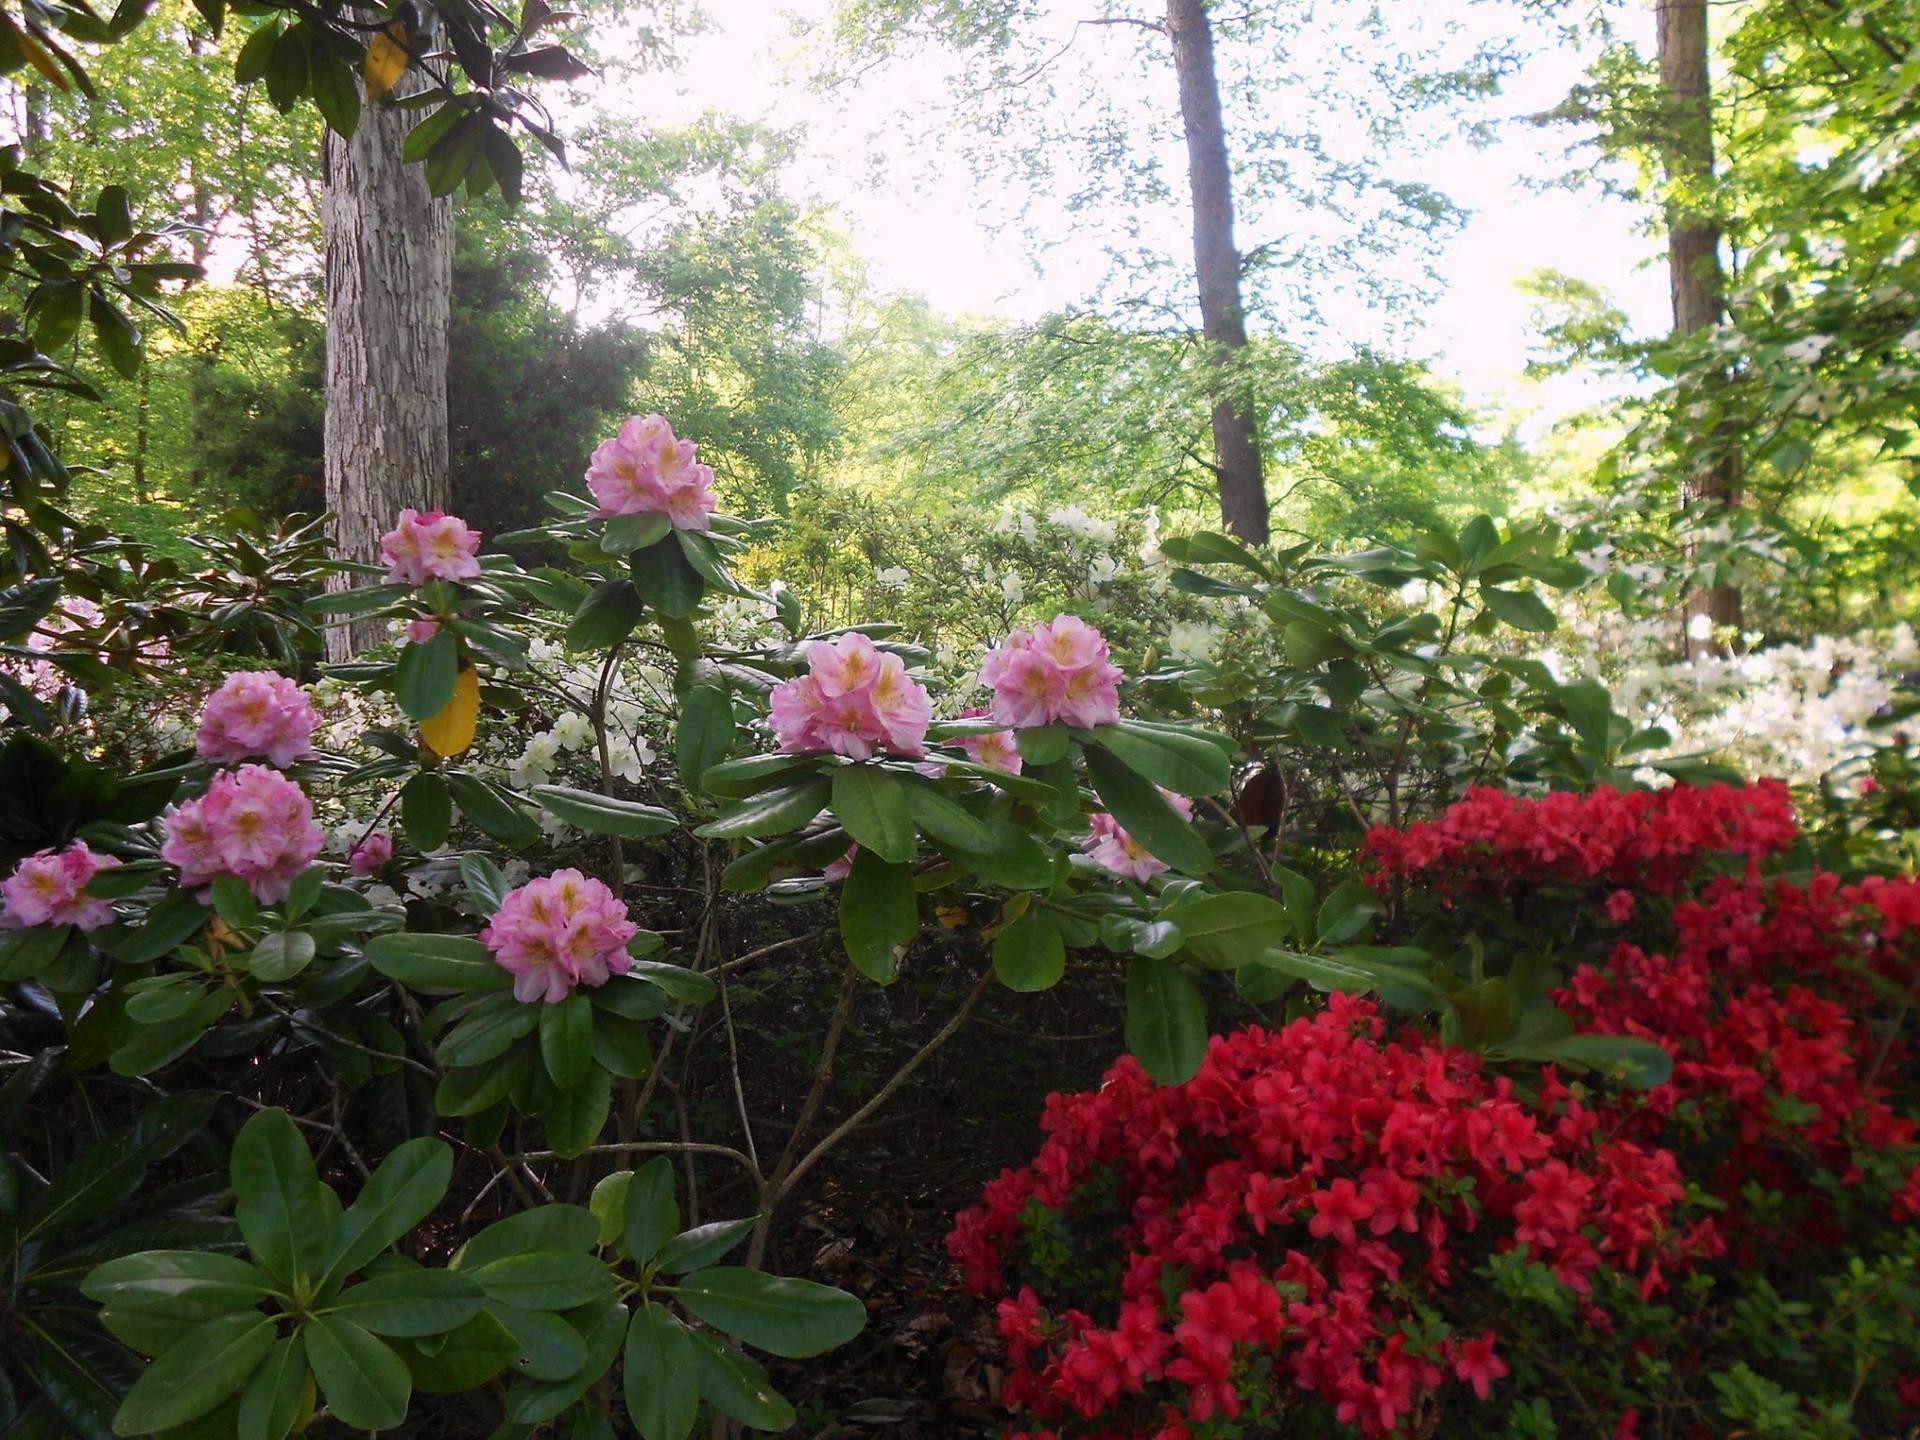 Mirta Martin's garden in Virginia